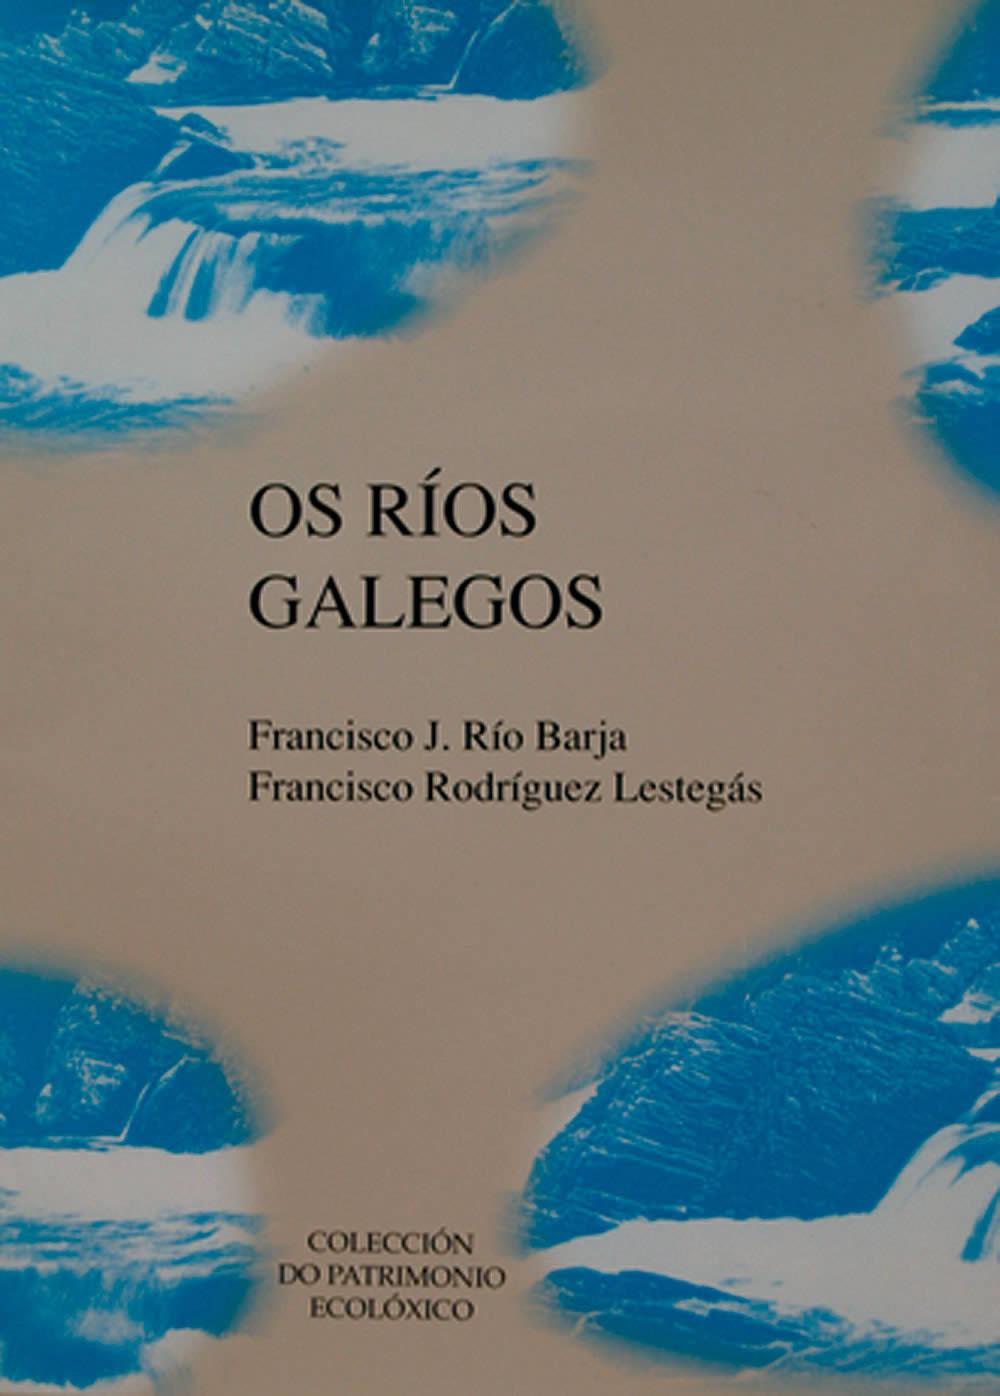 Portada de Os ríos galegos